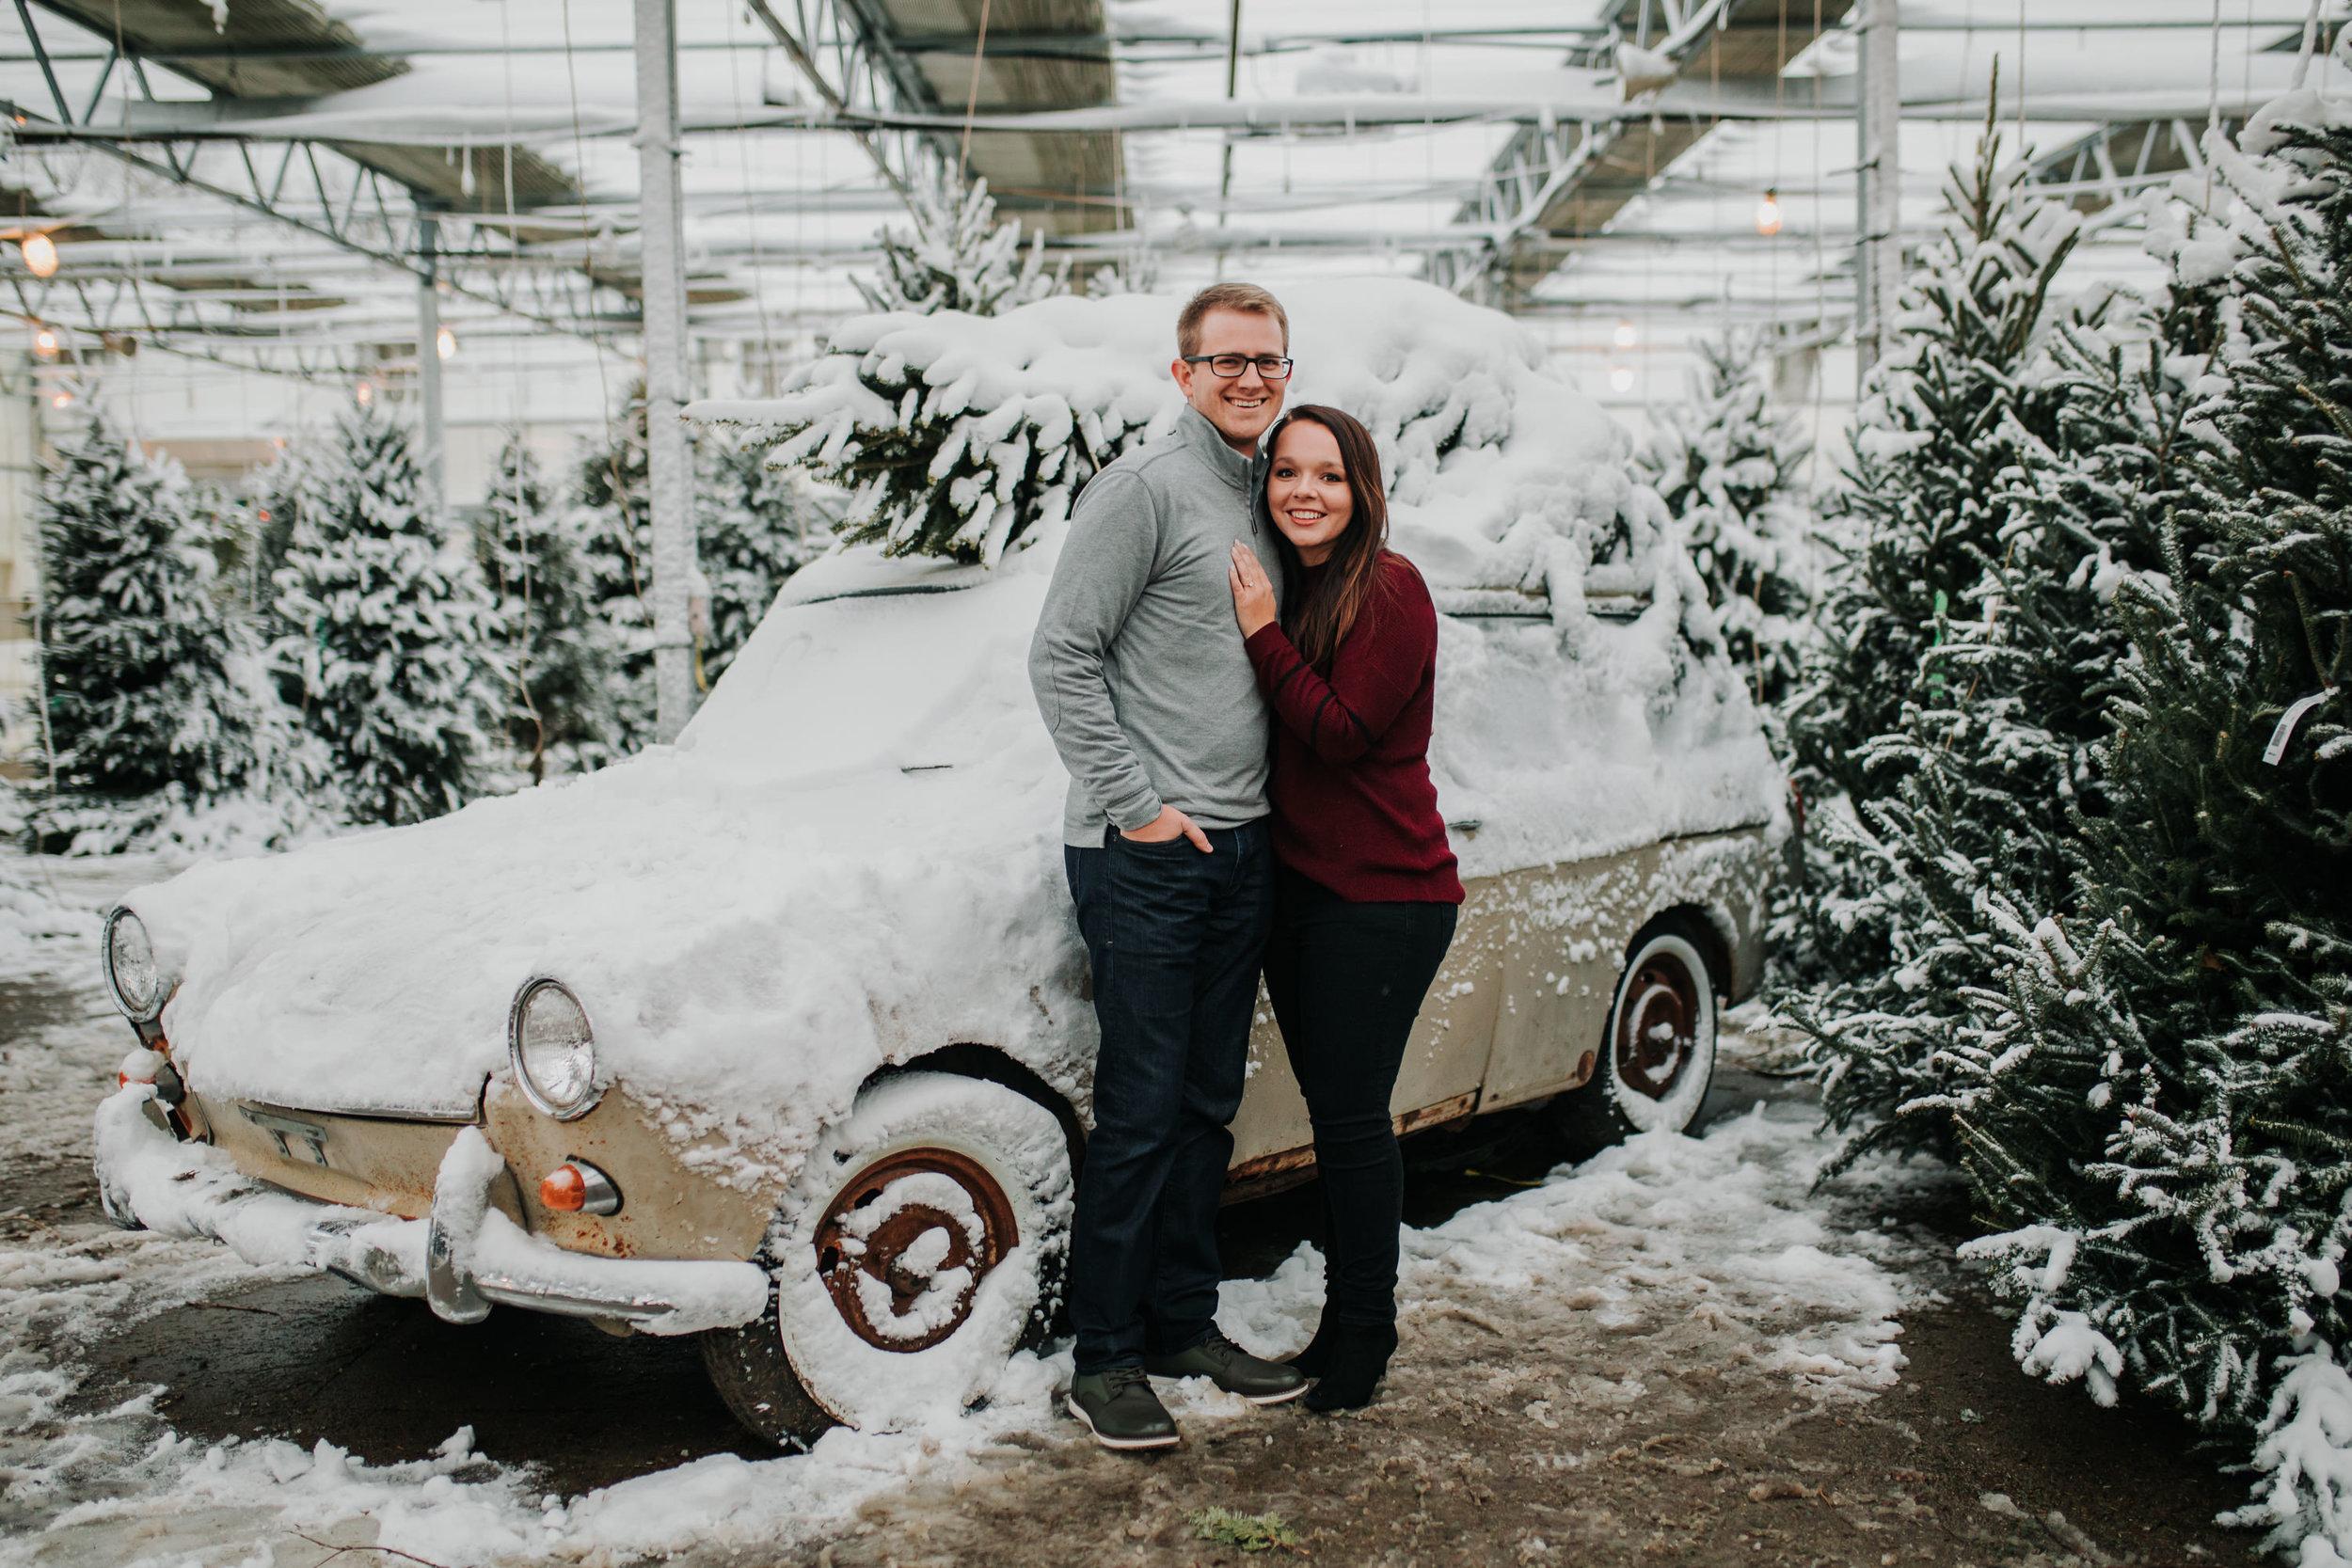 Vanessa & Dan - Engaged - Nathaniel Jensen Photography - Omaha Nebraska Wedding Photographer - Standing Bear Lake - Snowy Engagement Session-83.jpg